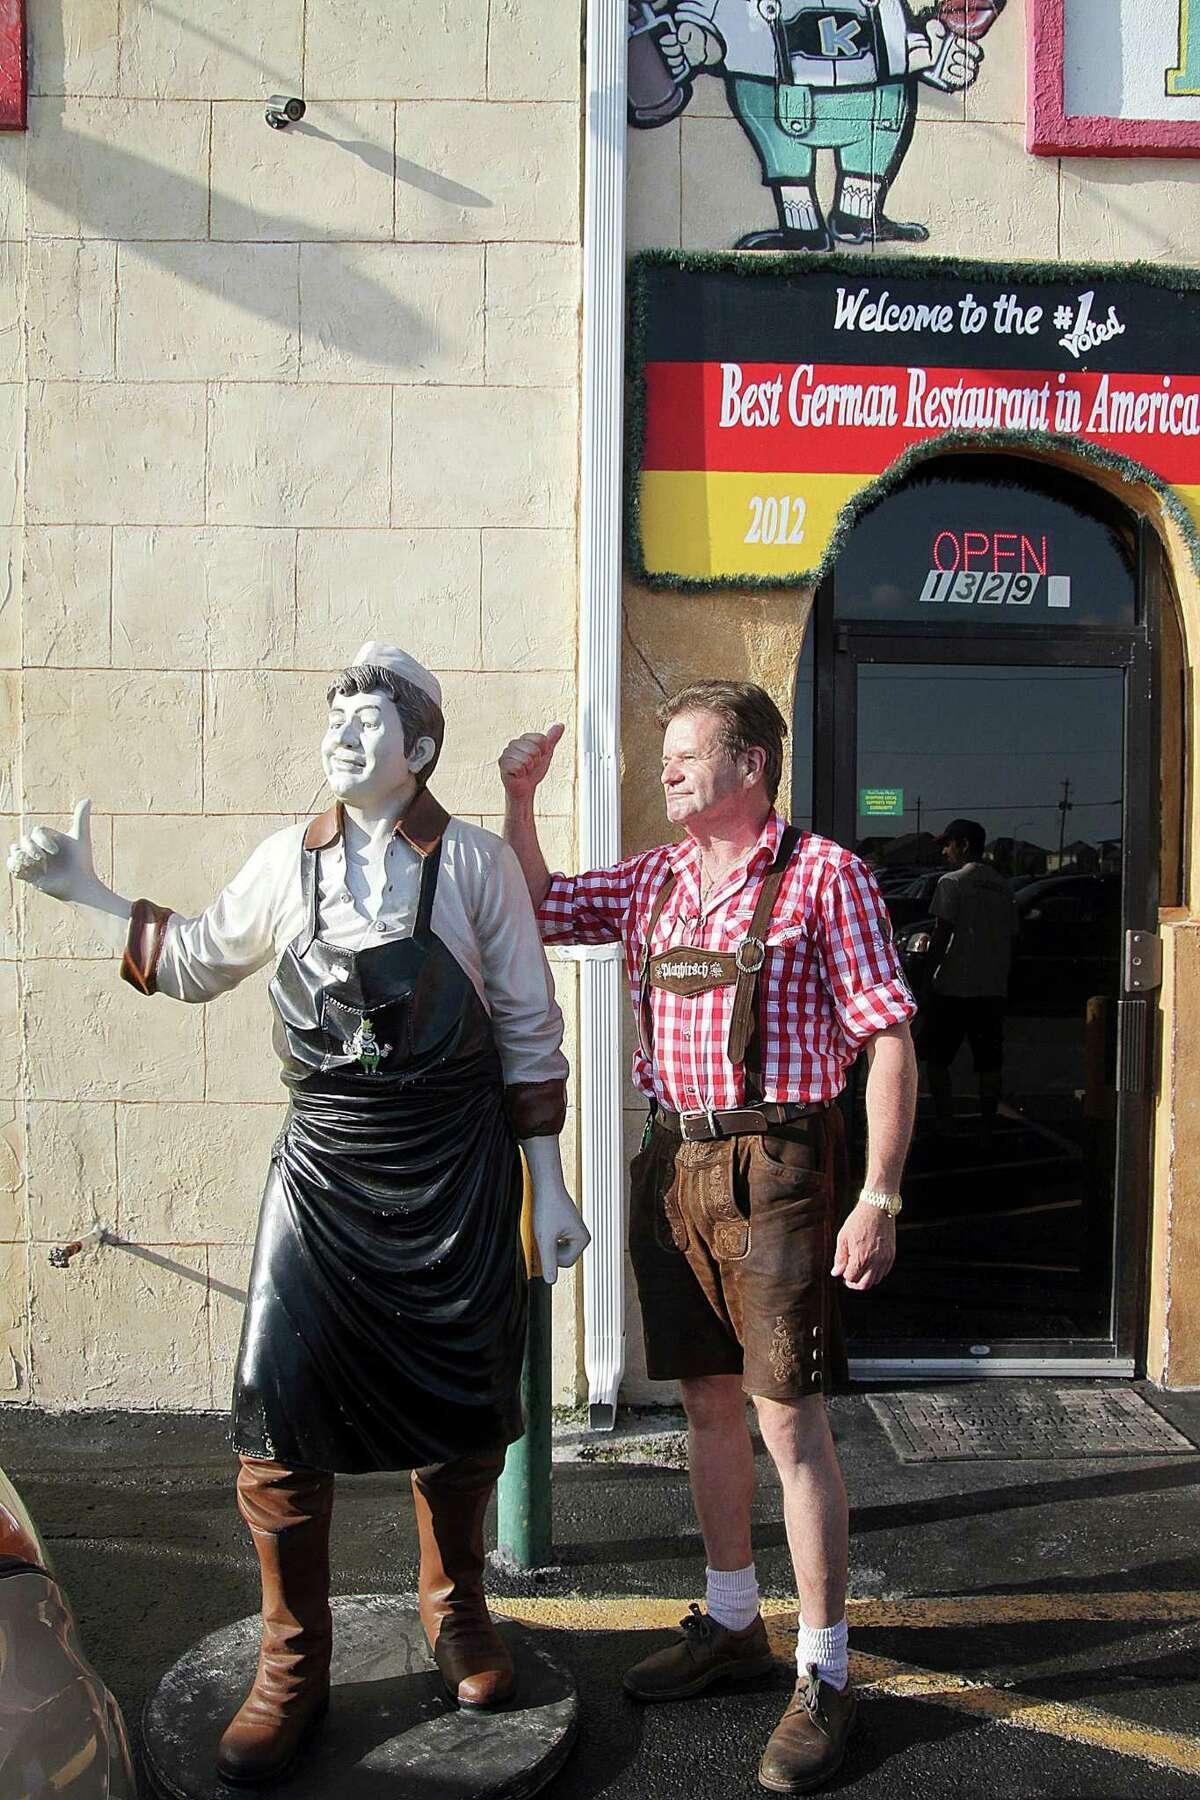 Johann Sitter poses for a photo outside his restaurant. King's Biergarten & Restaurant serves German cuisine and a selection of beers. Johann Sitter poses for a photo outside his restaurant. King's Biergarten & Restaurant serves German cuisine and a selection of beers.